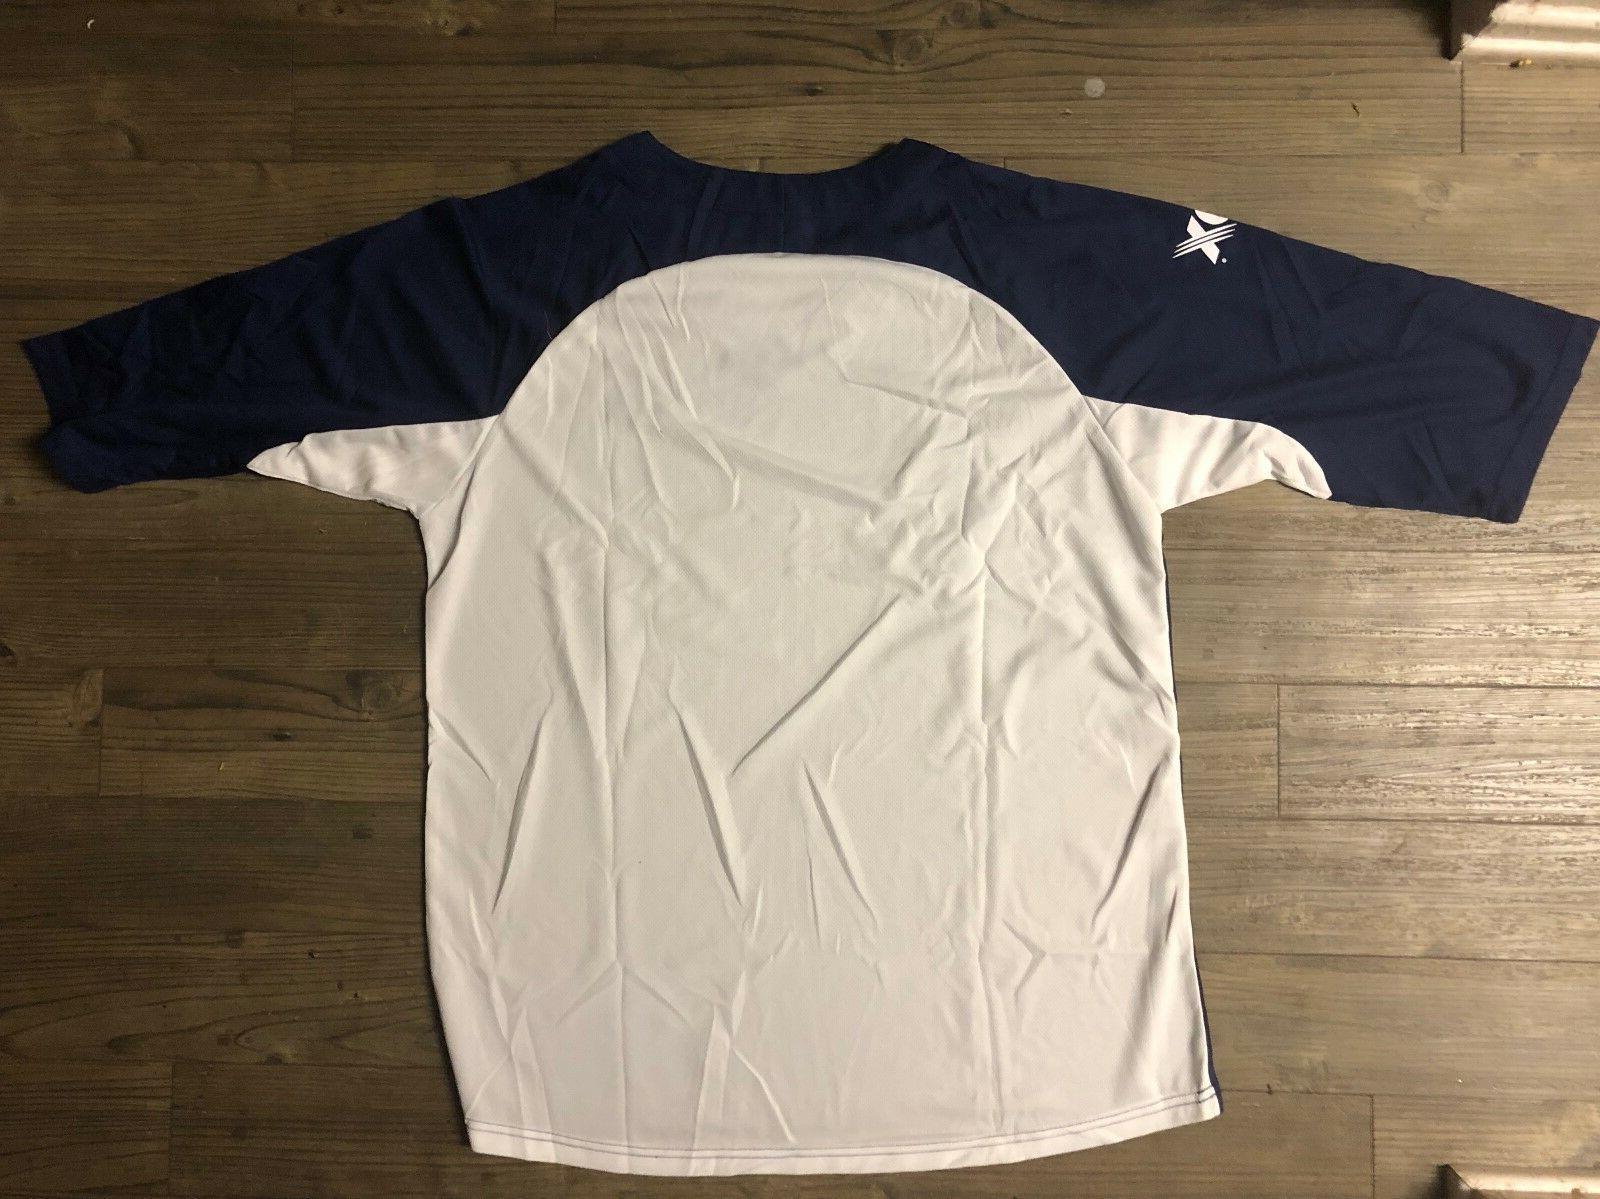 SAN PADRE replica Batting jersey ~ Adult 14